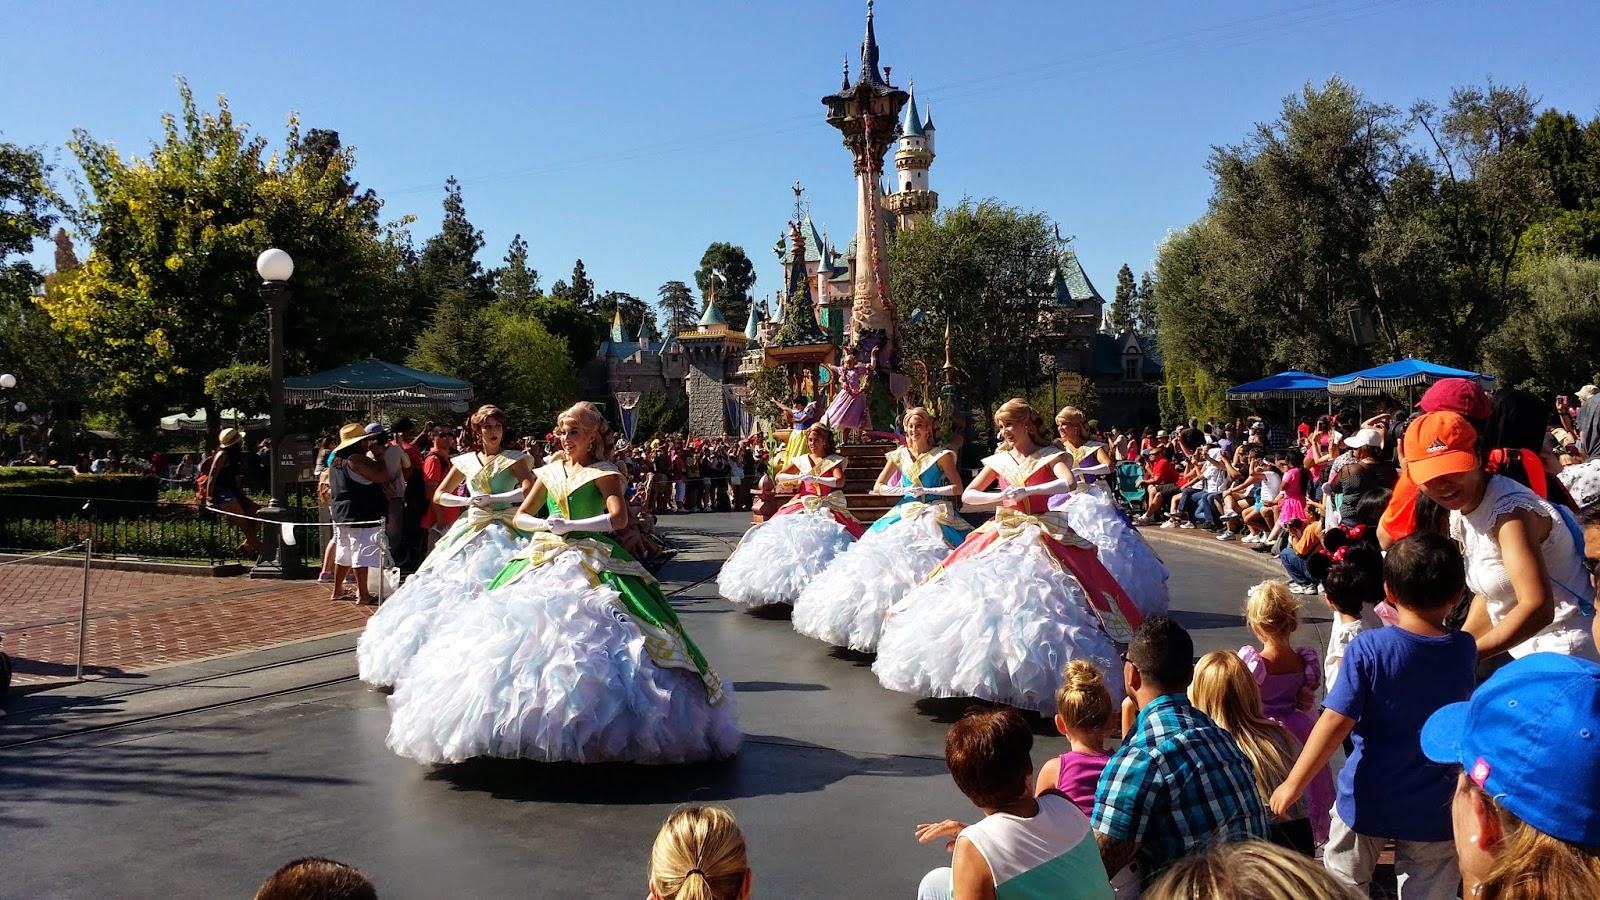 Travel USA, disneyland USA, Disneyland anaheim, walt disney, USA california, fantasyland, disney advanture, disney parade